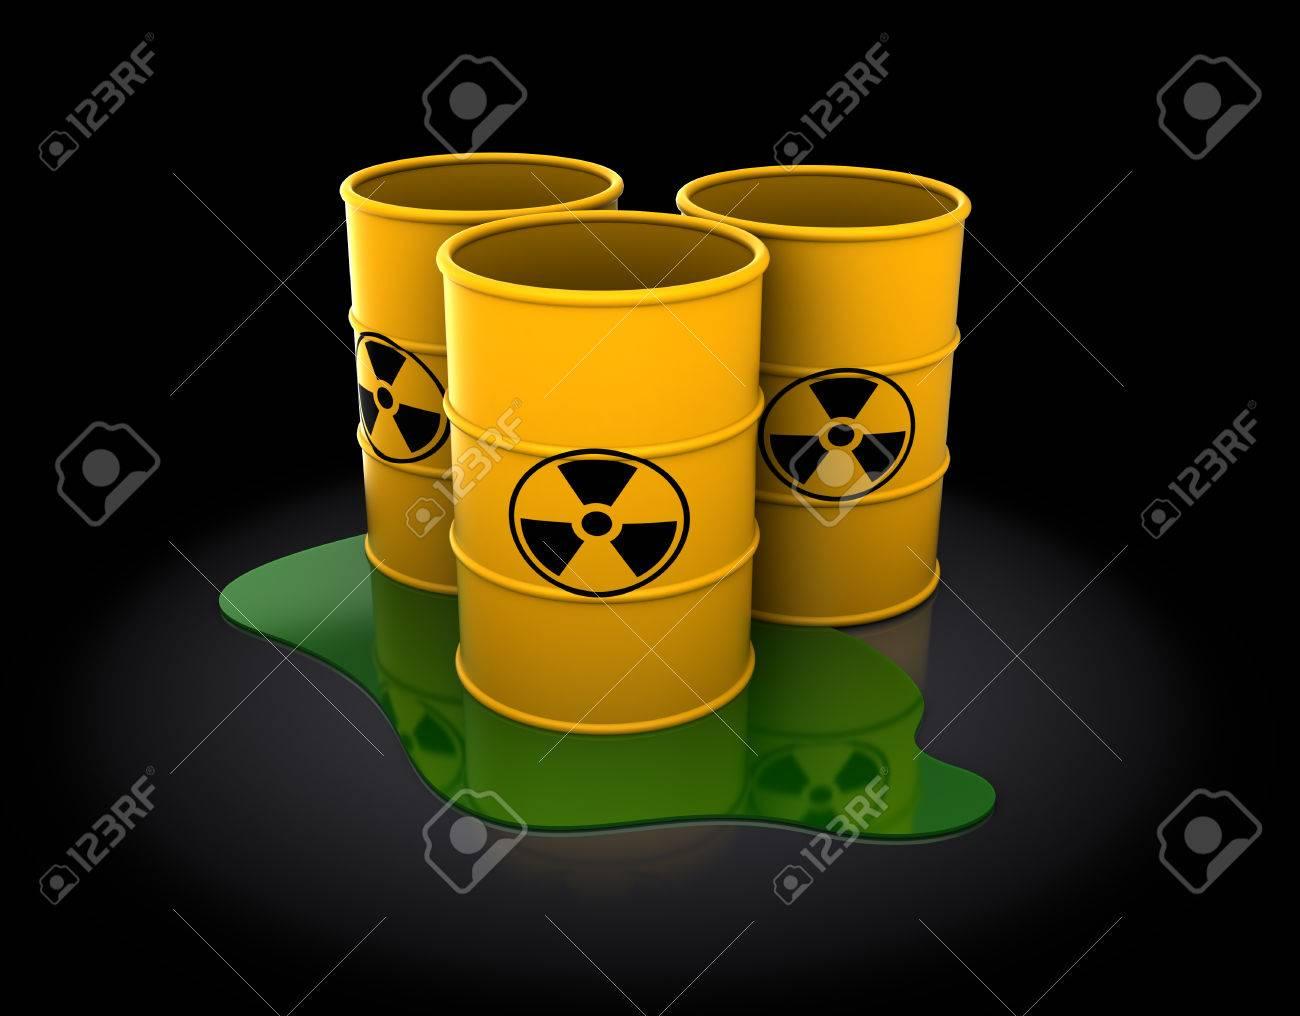 3d illustration of three radioactive barrels over dark background Stock Illustration - 25603916